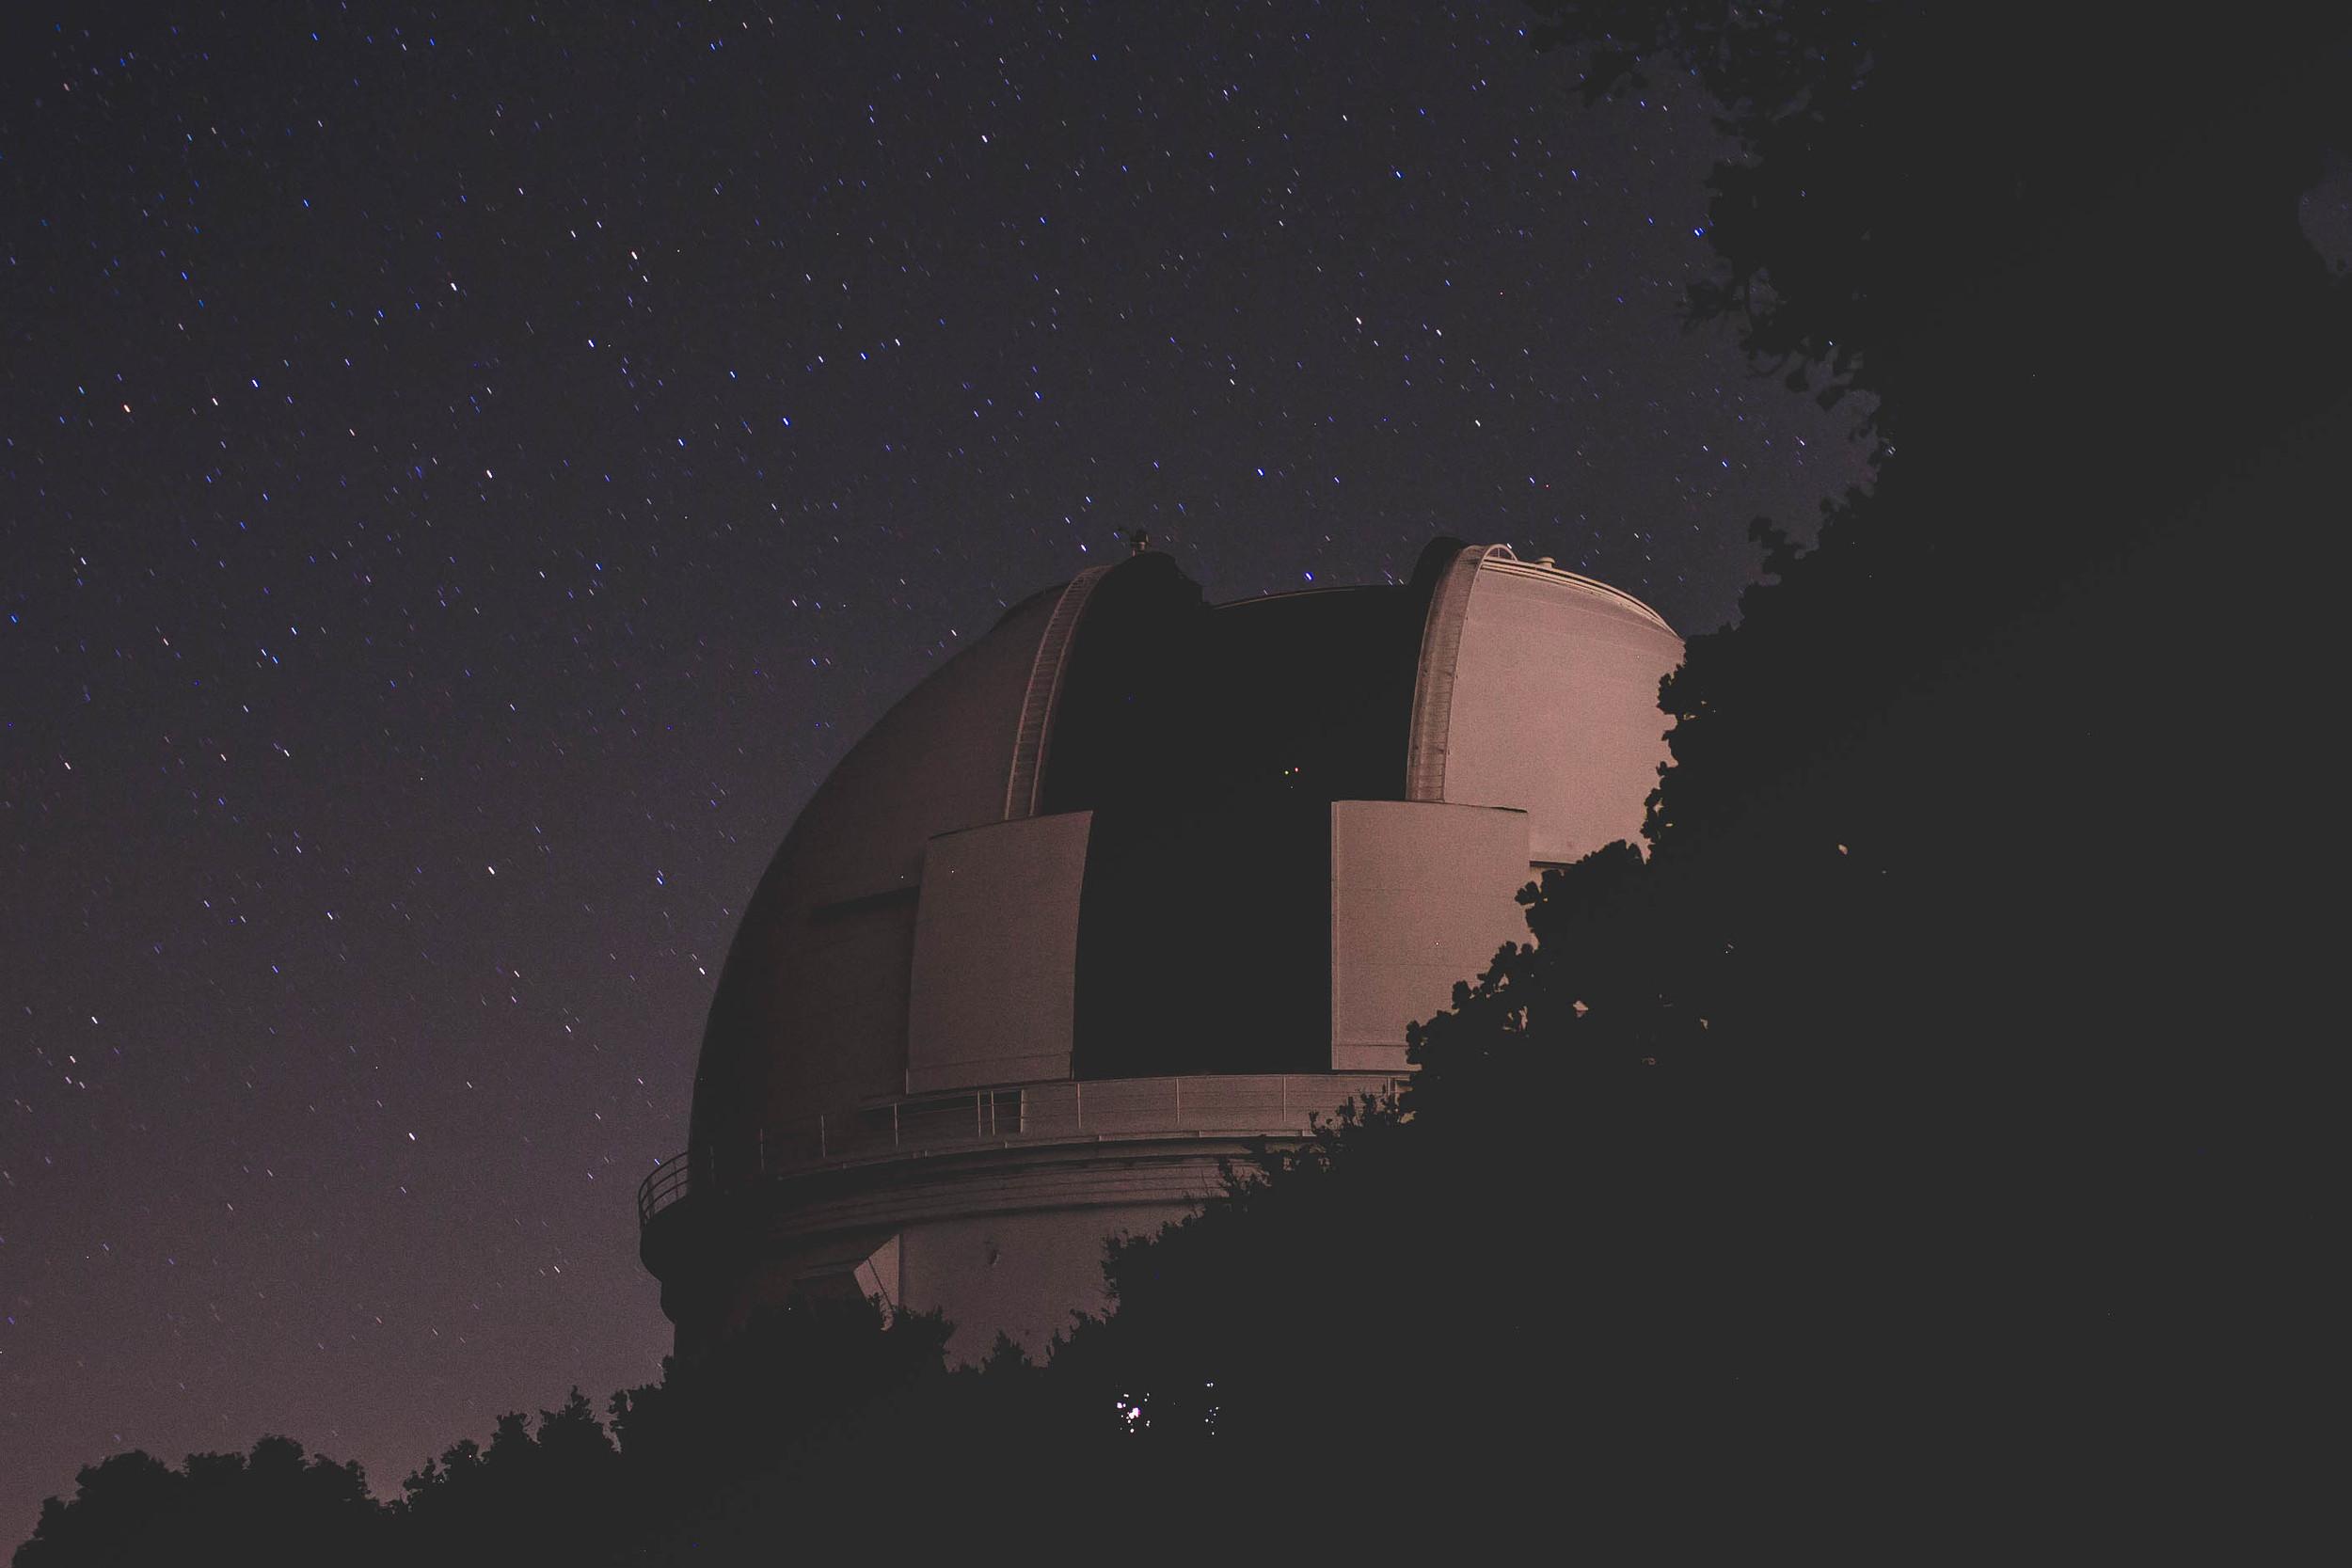 Lick+Observatory.jpeg